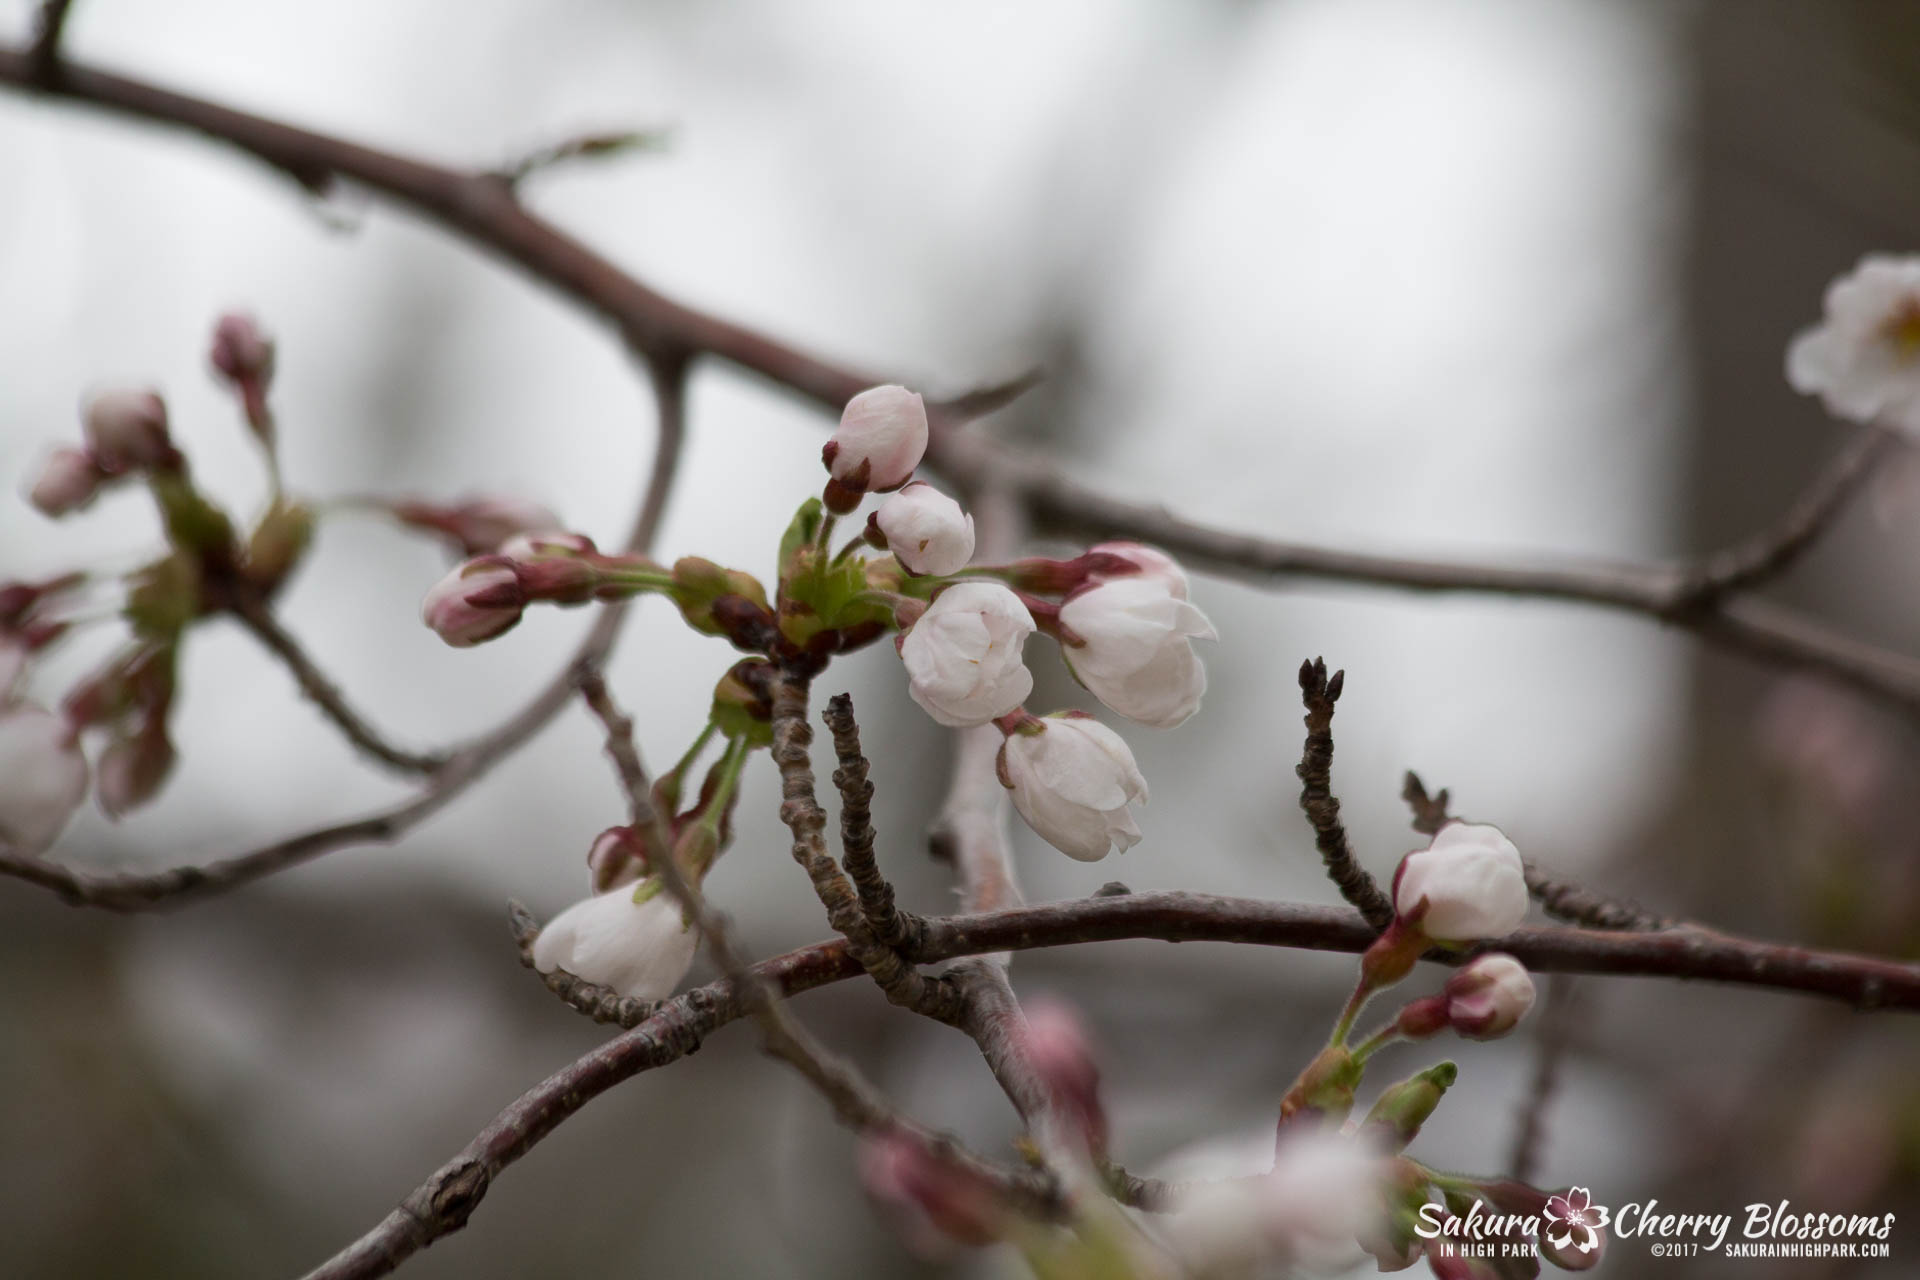 Sakura-Watch-April-21-2017-bloom-still-in-early-stages-37.jpg